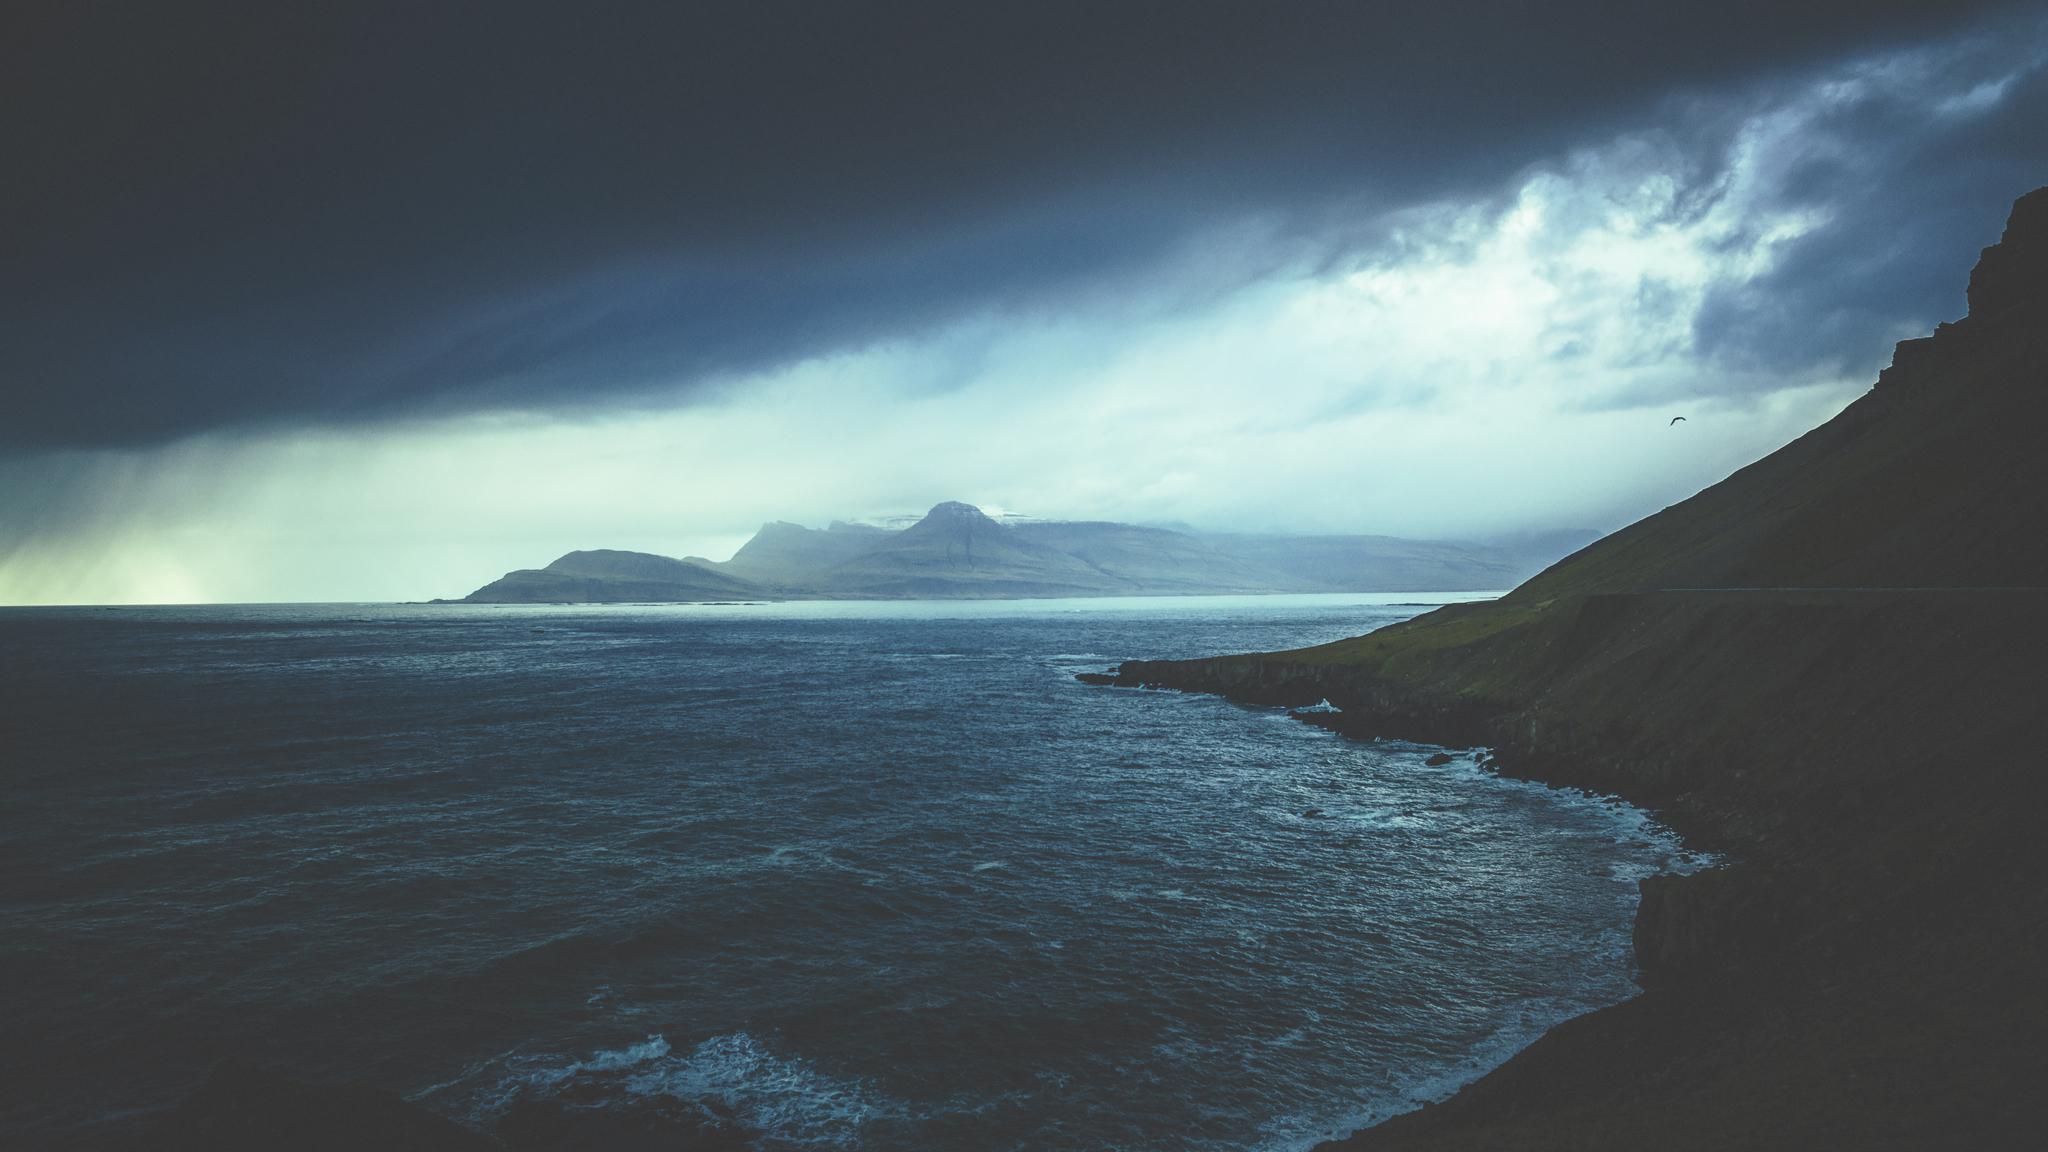 iceland, jennifer picard photography, travel photographer